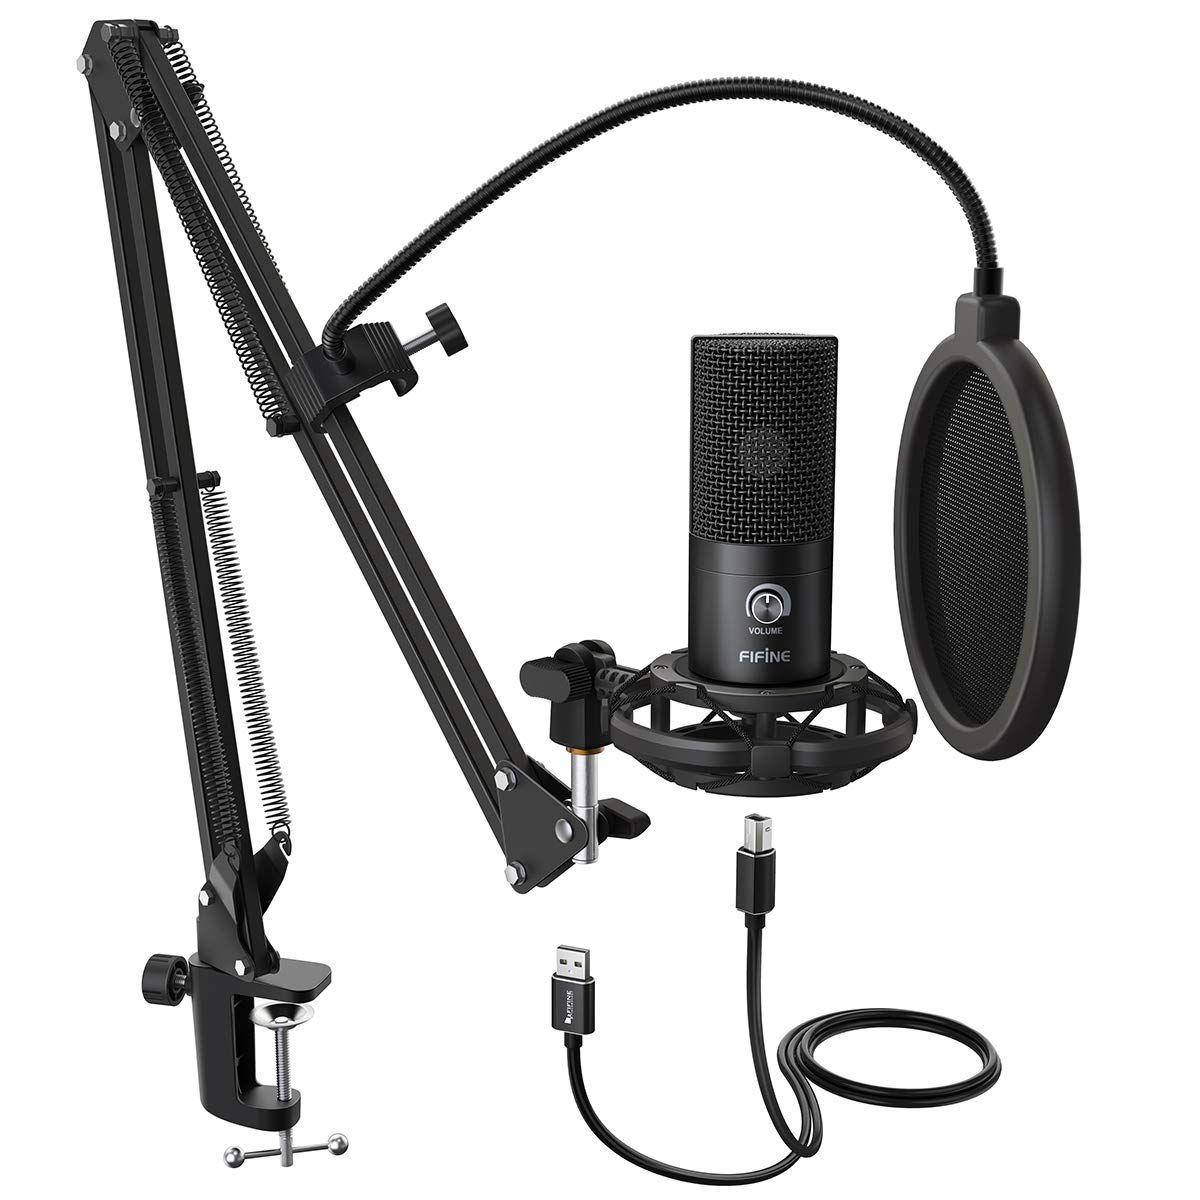 Fifine Studio Condenser Usb Microphone In 2020 Usb Microphone Microphone Microphones